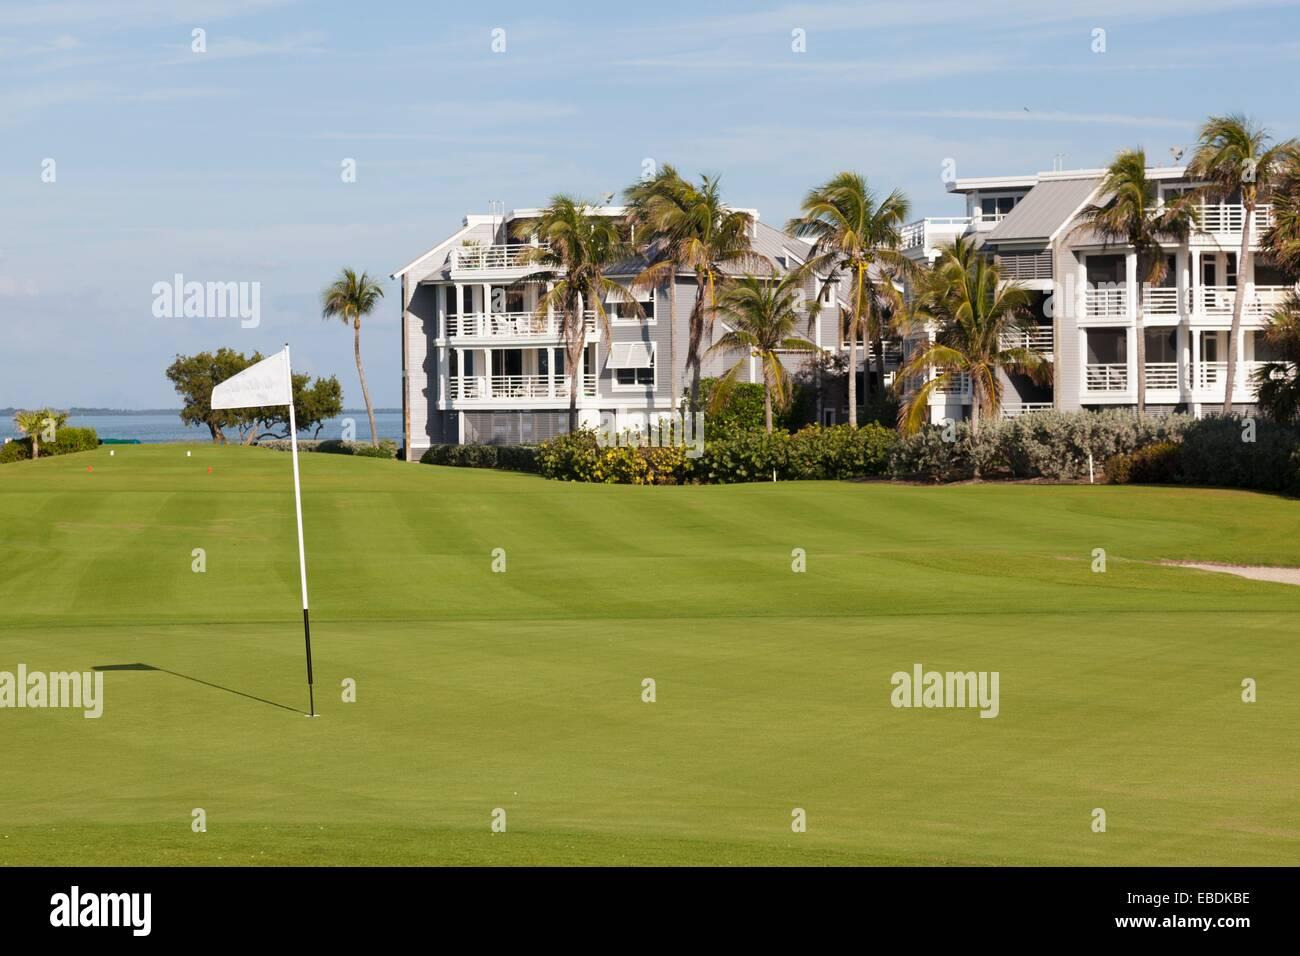 Golf course at South Seas Island Resort at Captiva, Florida, USA Stock Photo